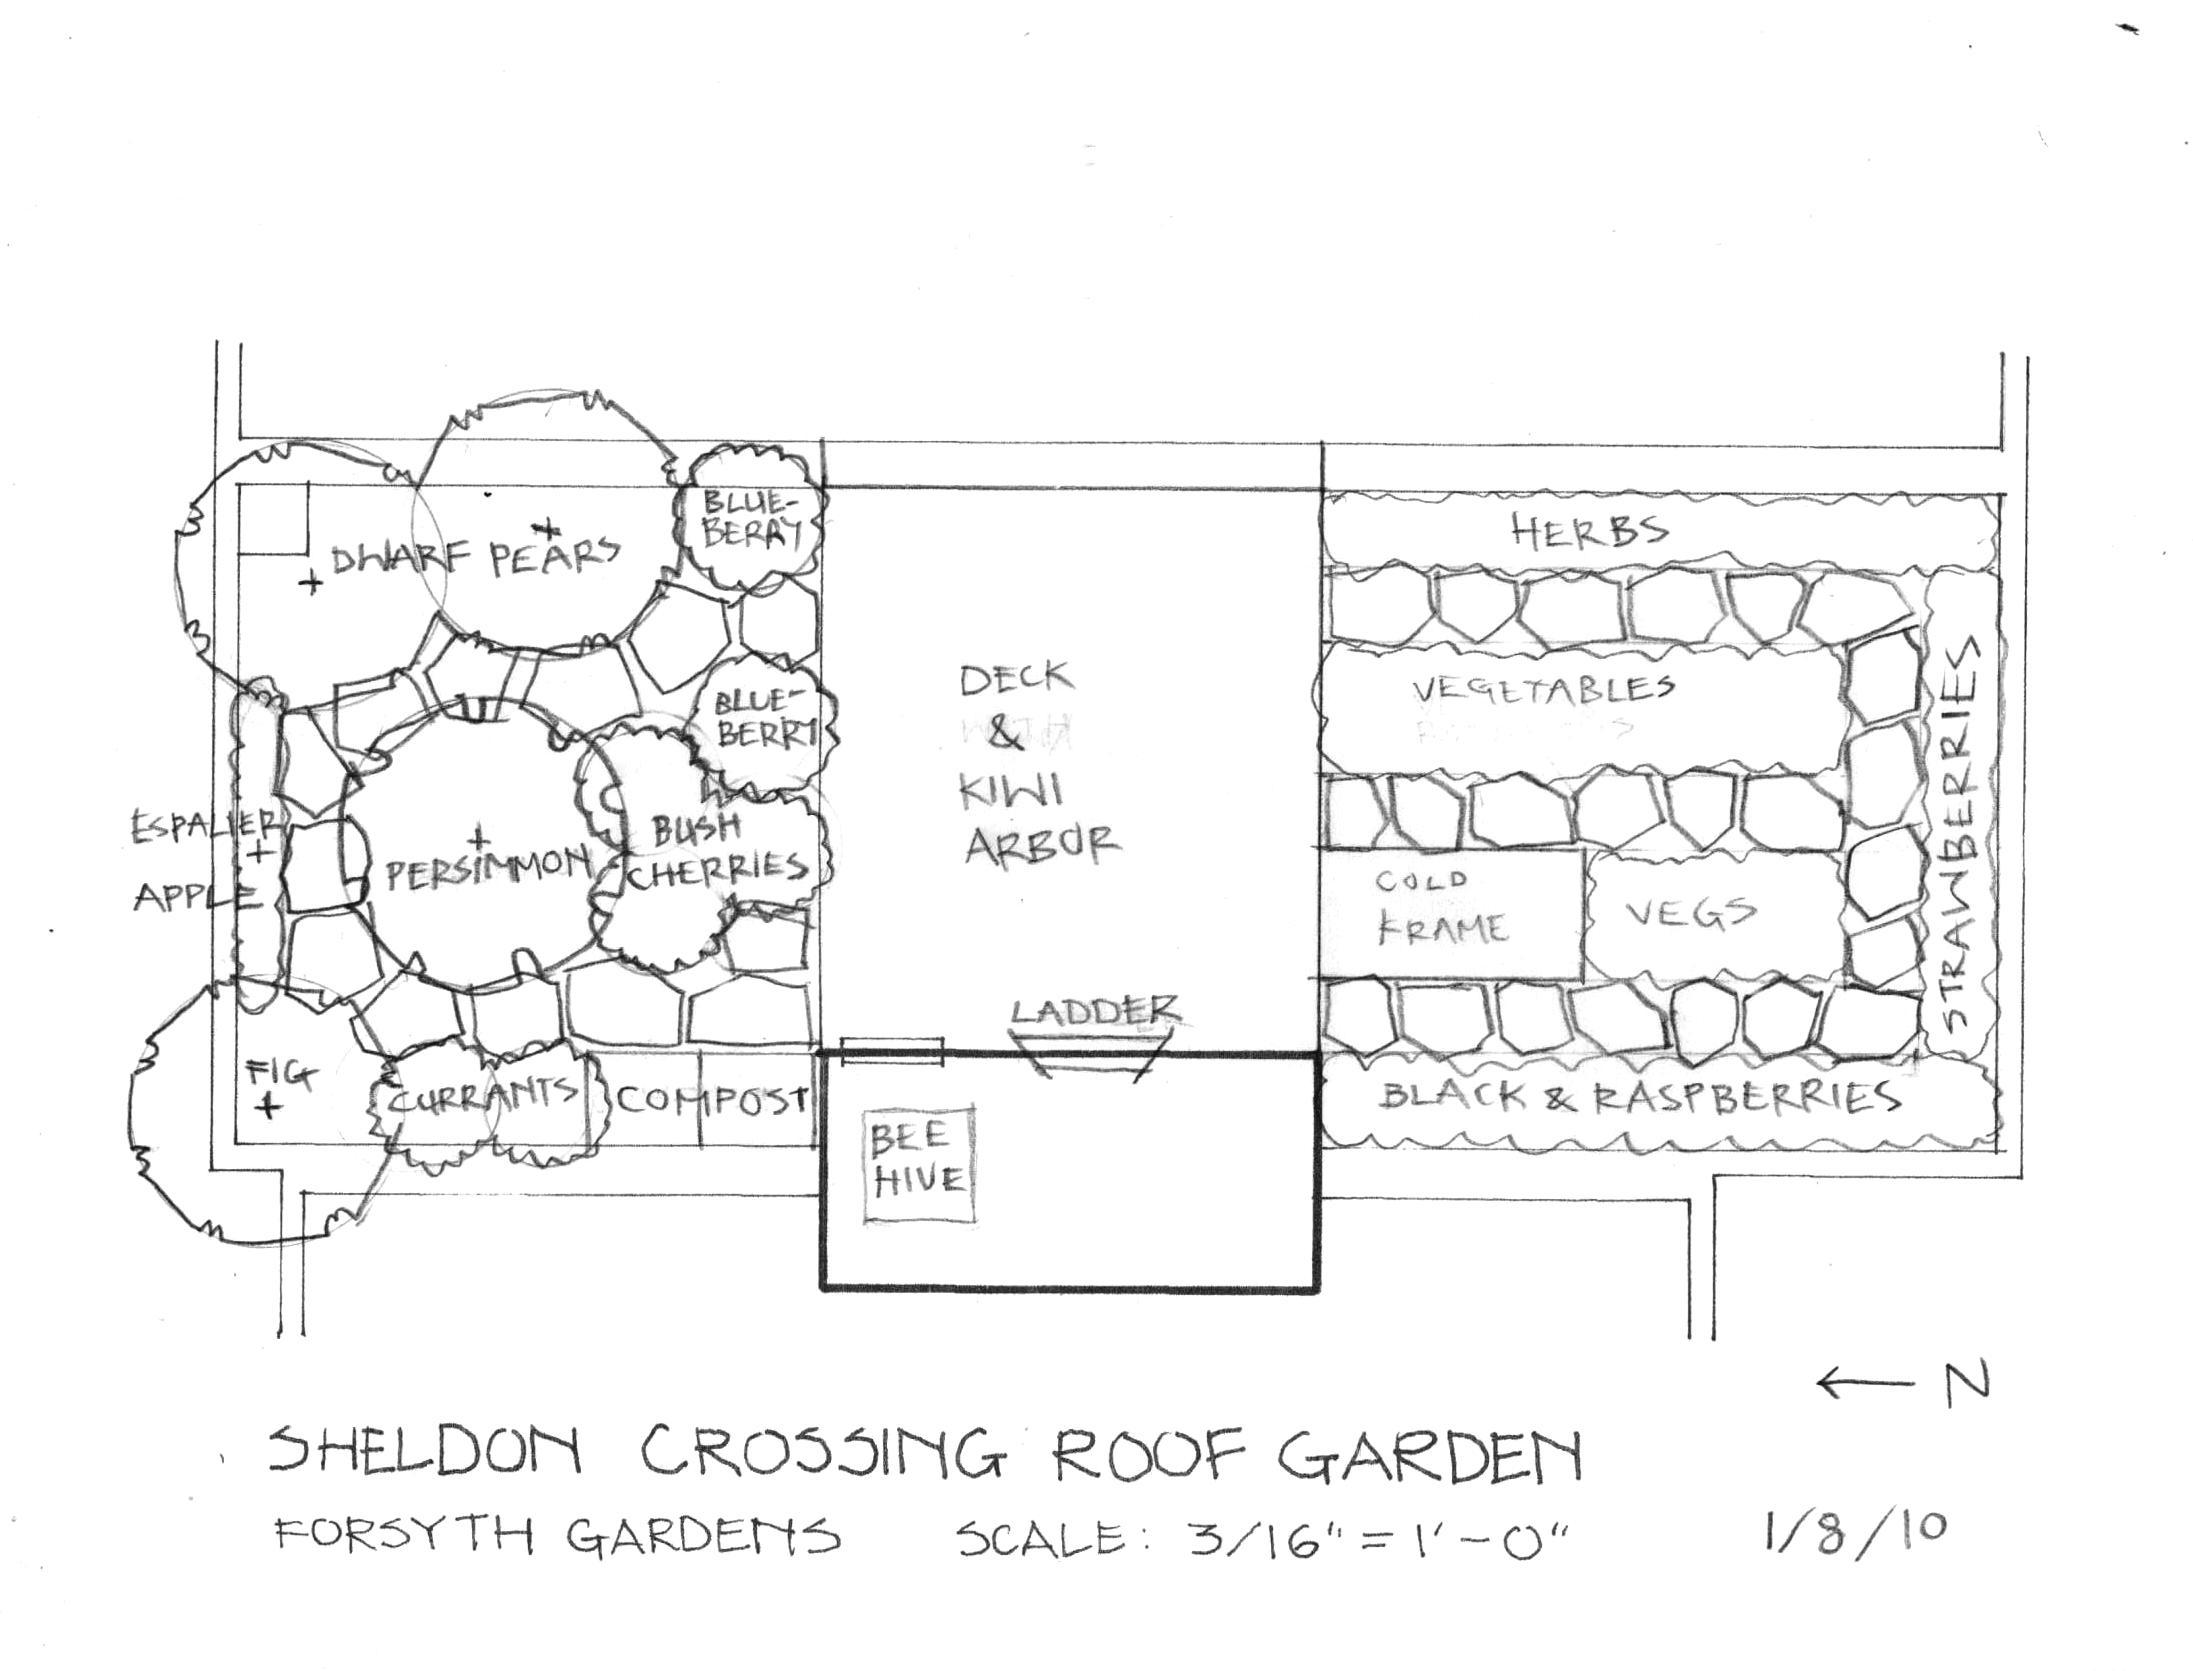 Prissy A Ranch Condo Home Landscape Plan Template Alternate Edible Landscape Phigblog Edible Urban Food Growing Landscape Plan outdoor Simple Landscape Plan